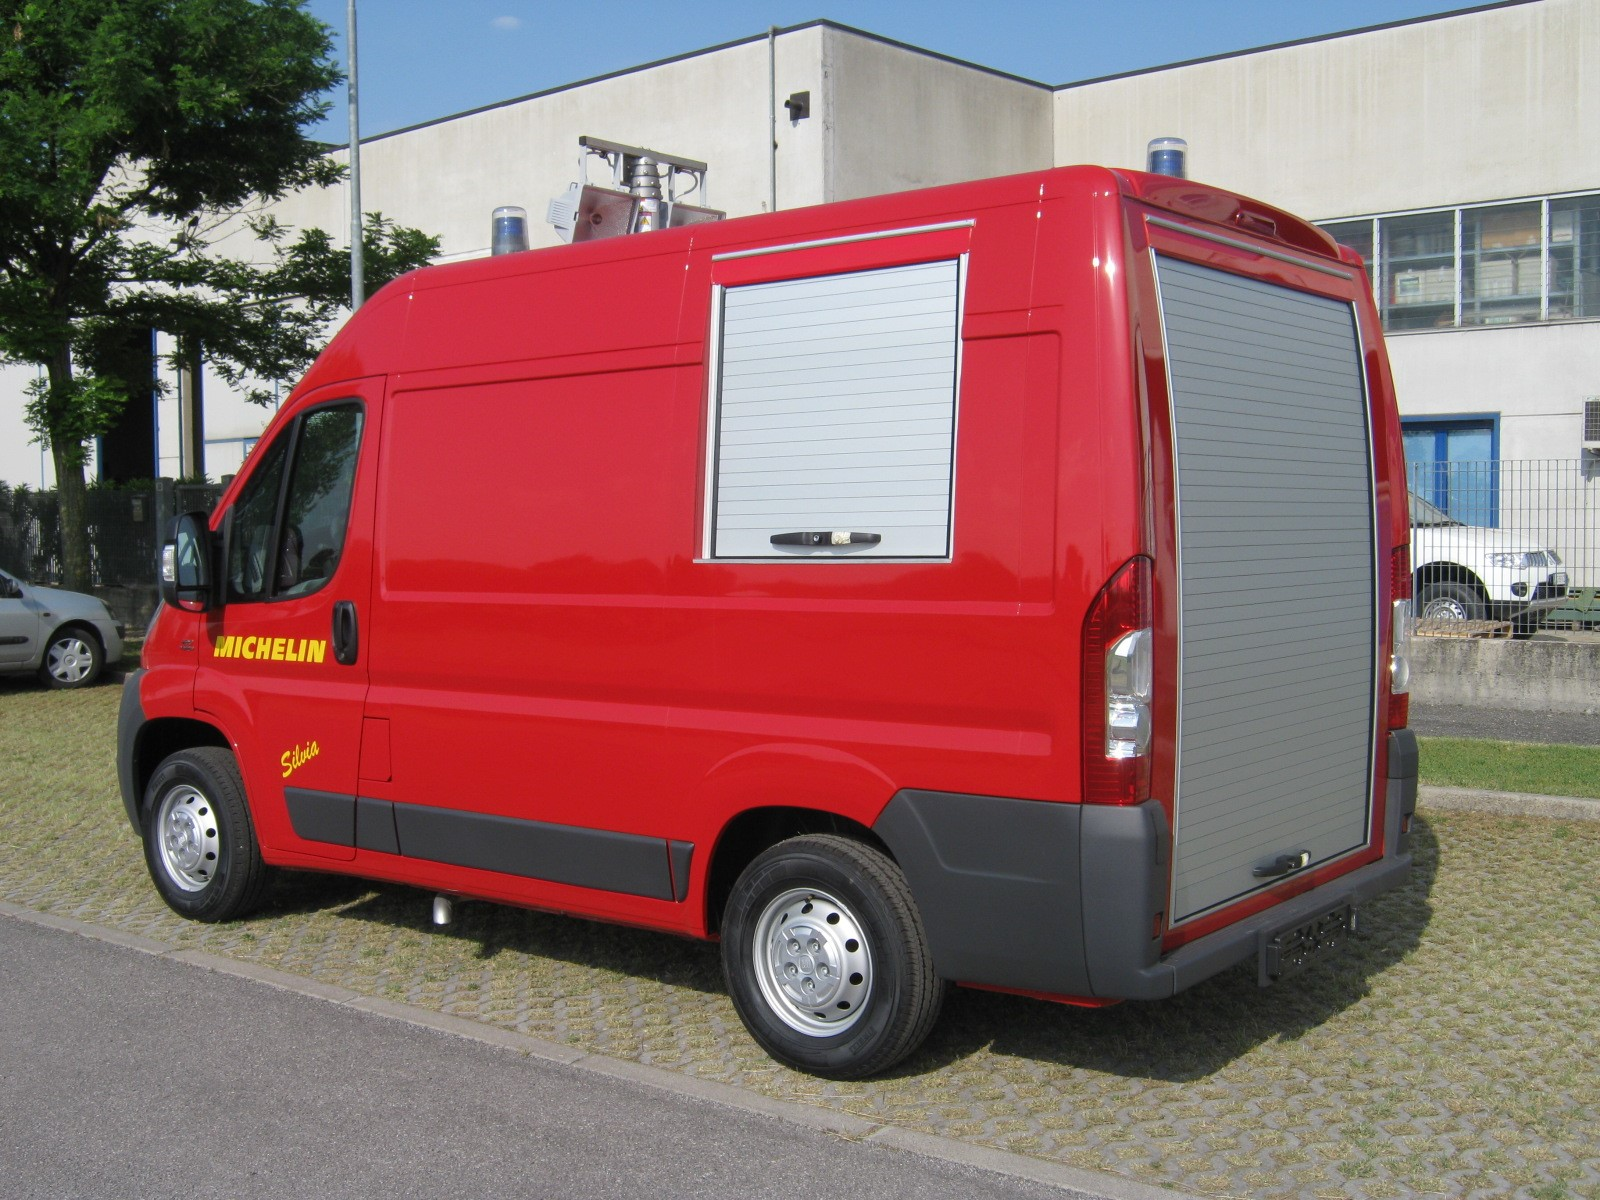 furgone-ducato-incendio-industriale